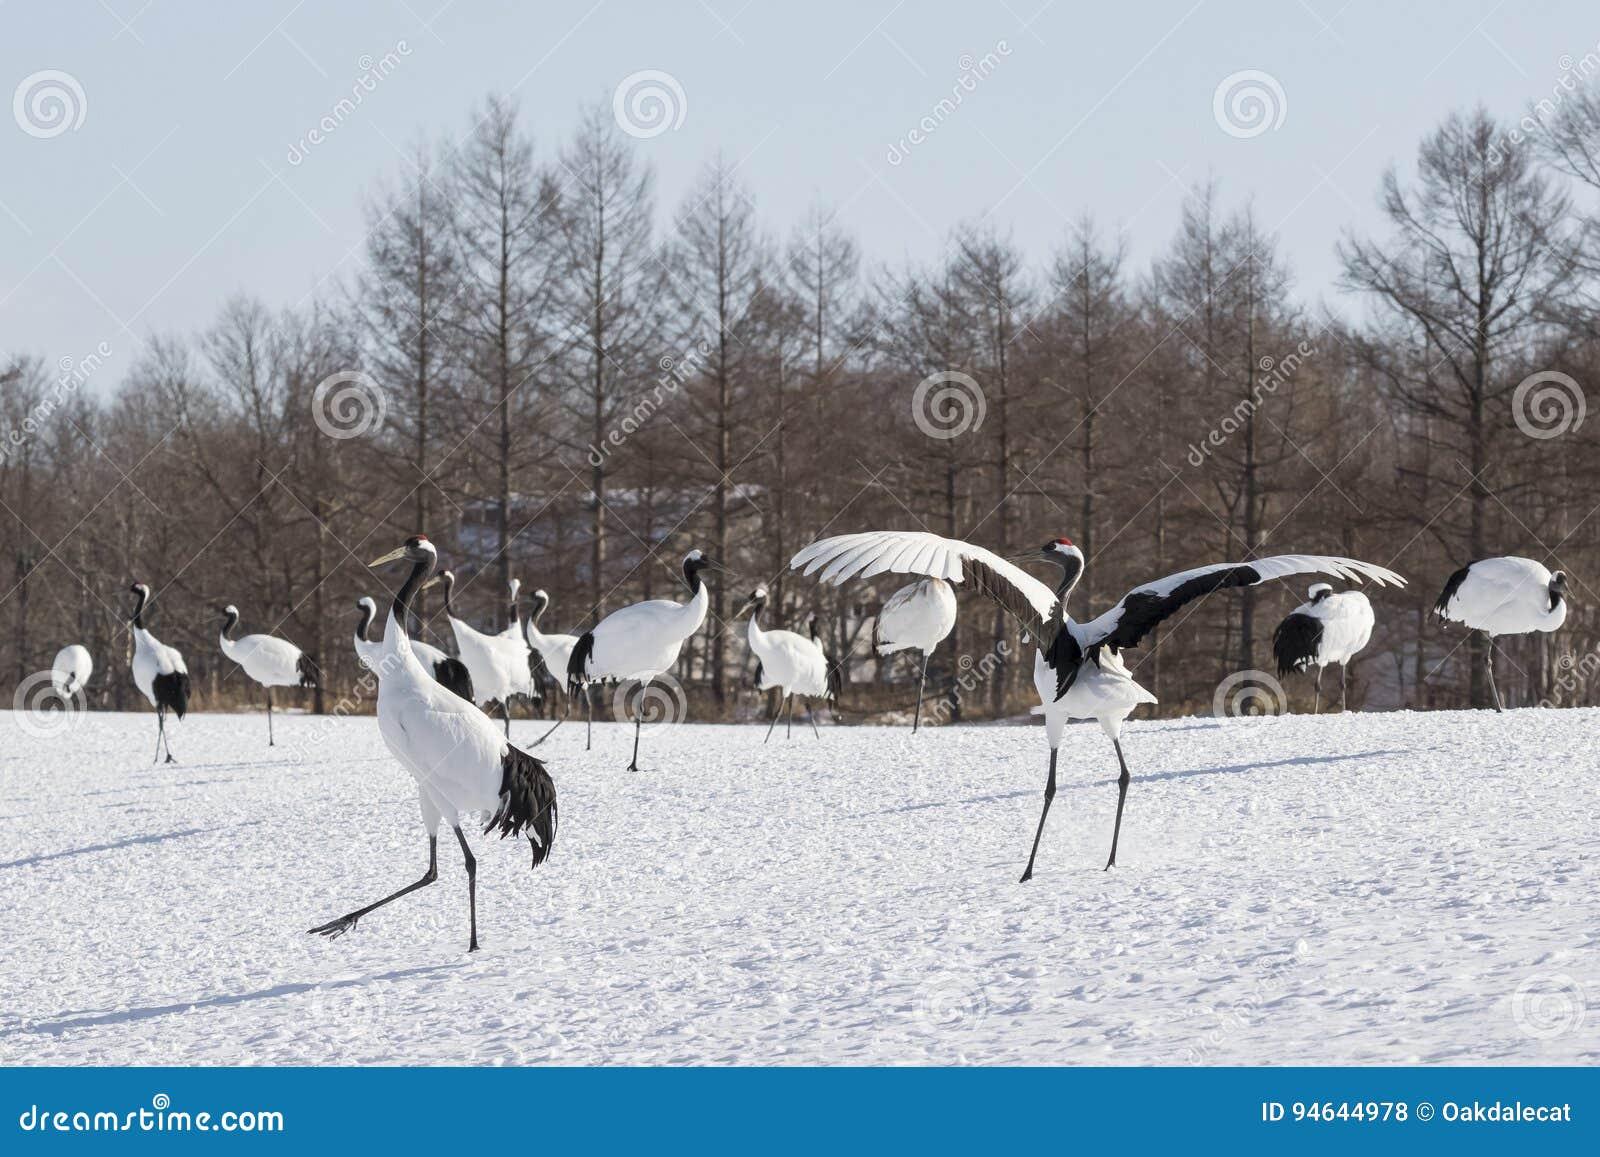 Japan Crane Dance Display